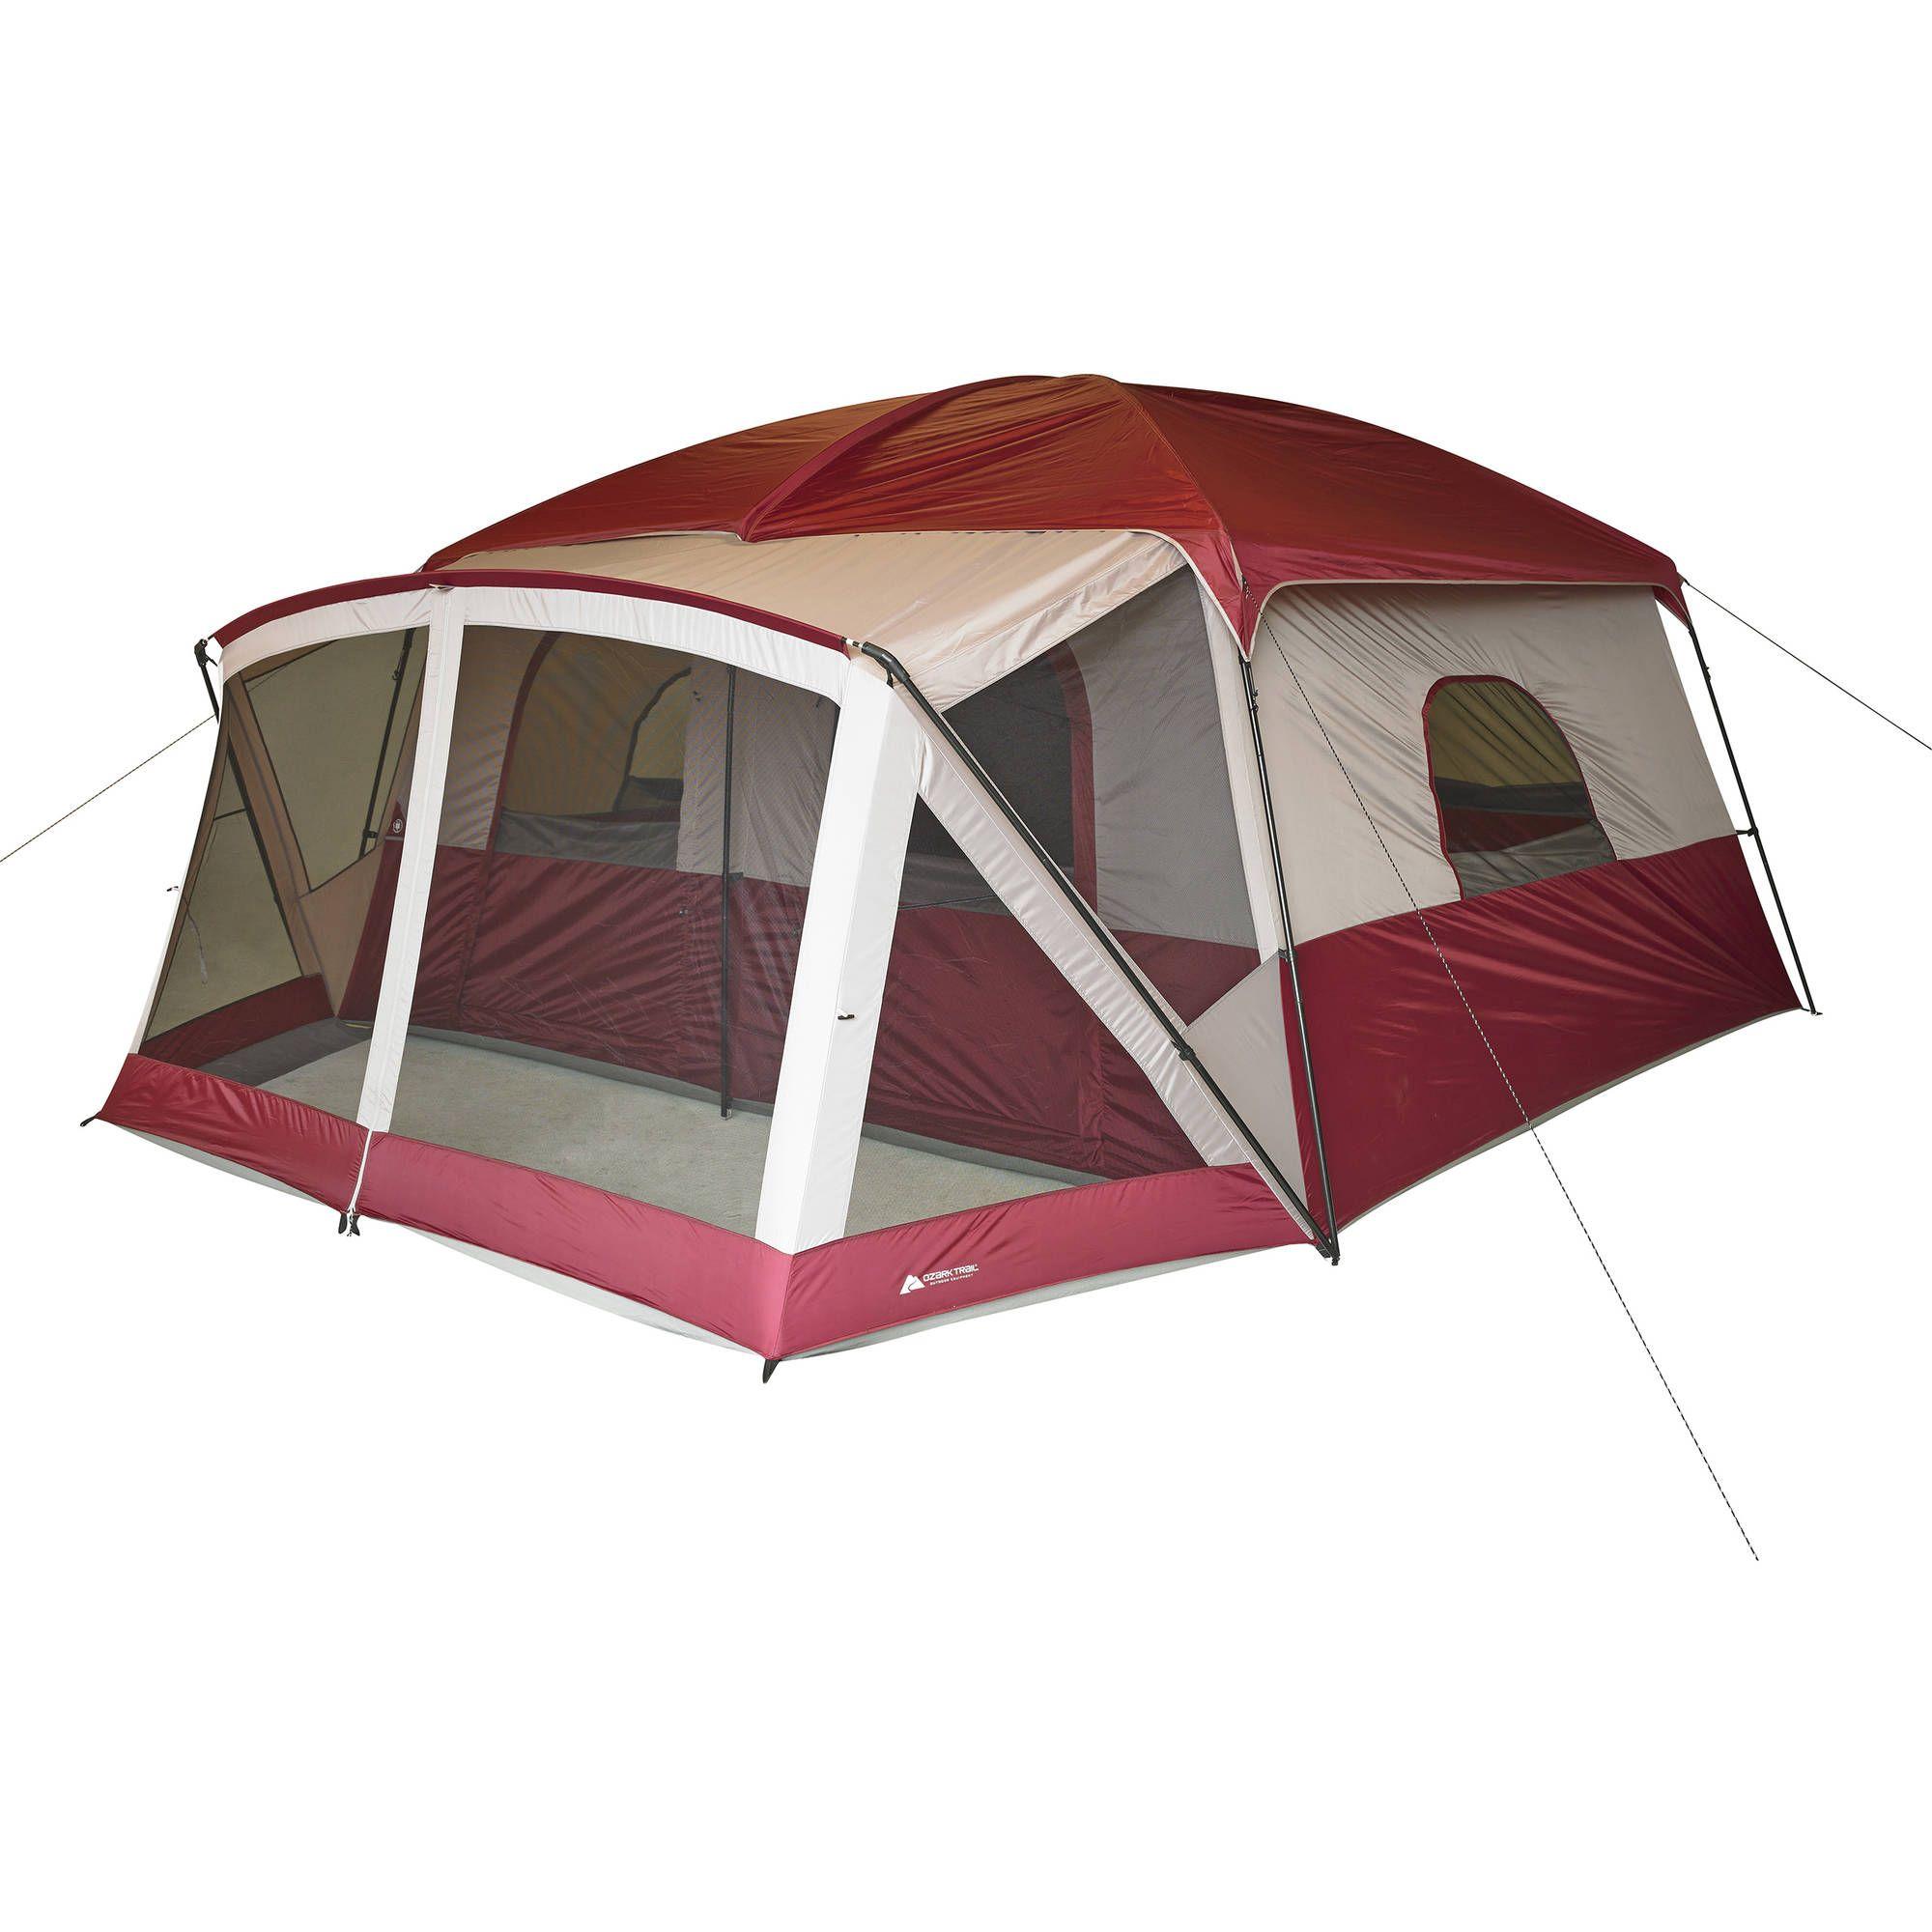 Alpine Design  Room Cabin Tent Instructions